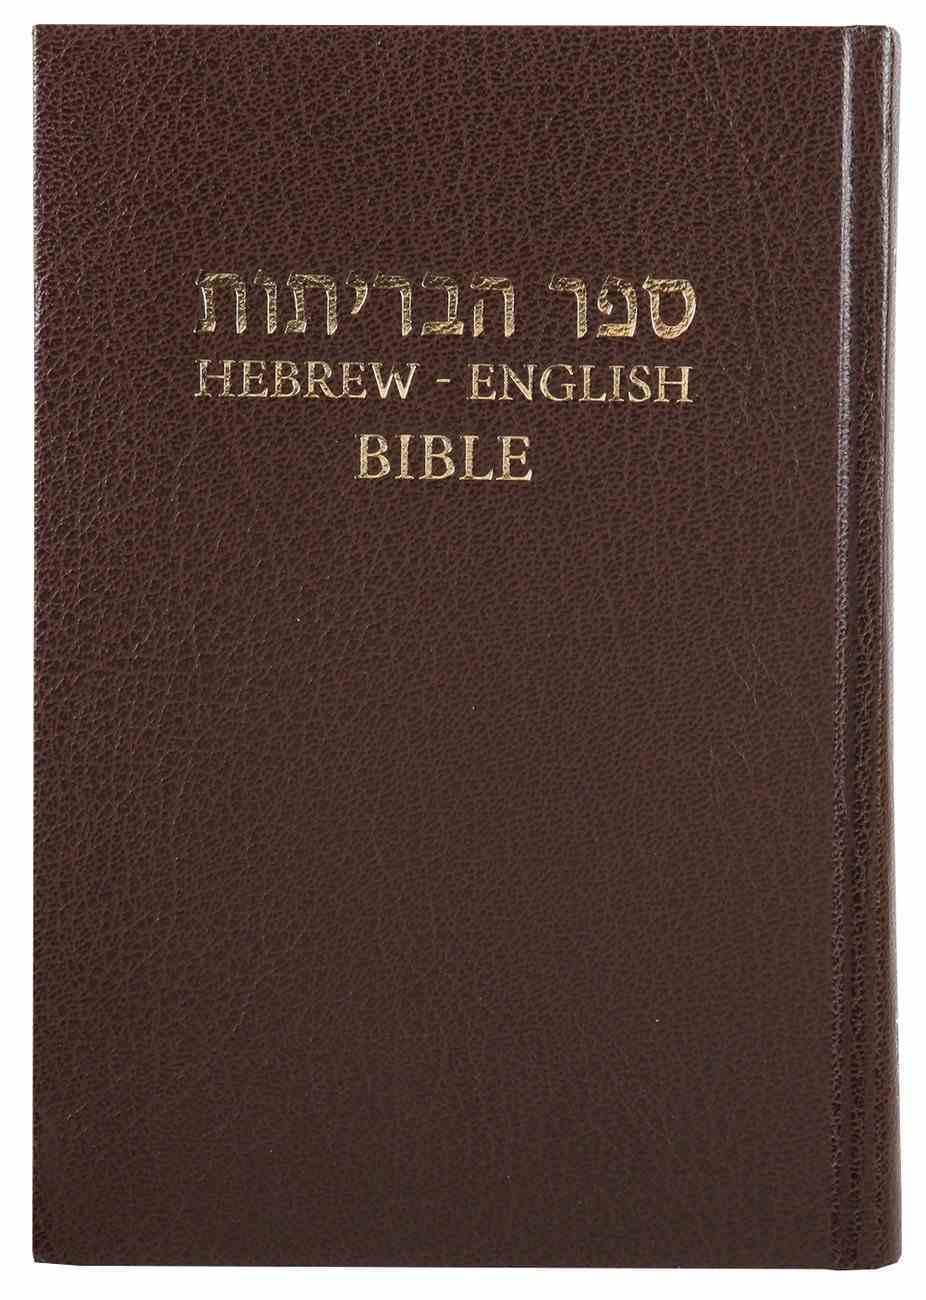 NASB Hebrew/English Parallel Bible Hardback